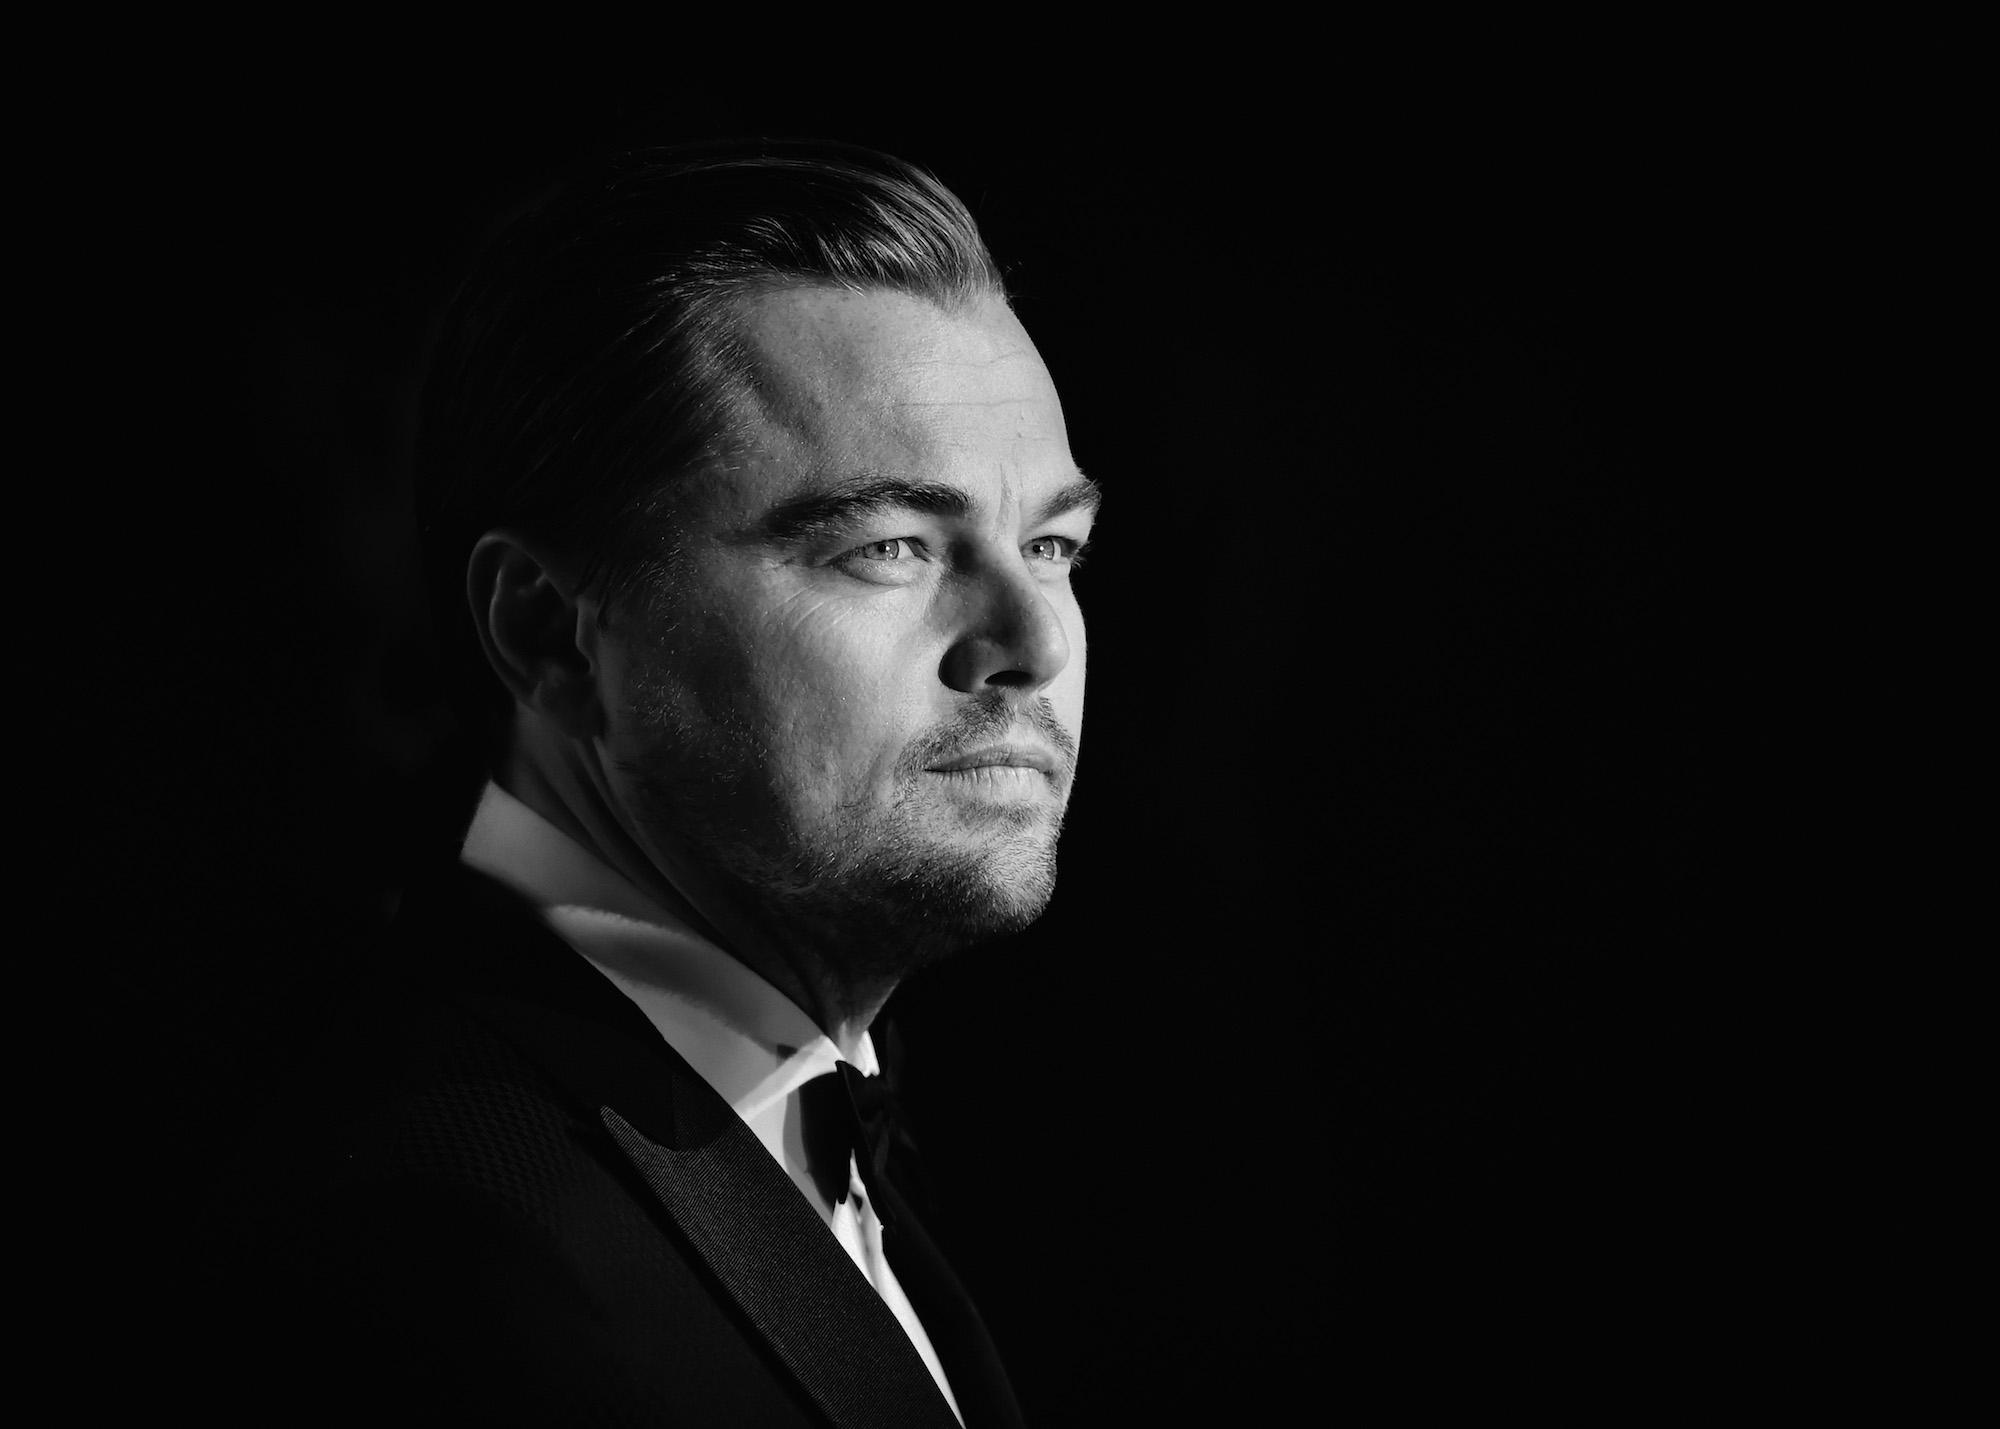 Portrait : Leonardo DiCaprio – L'héritier